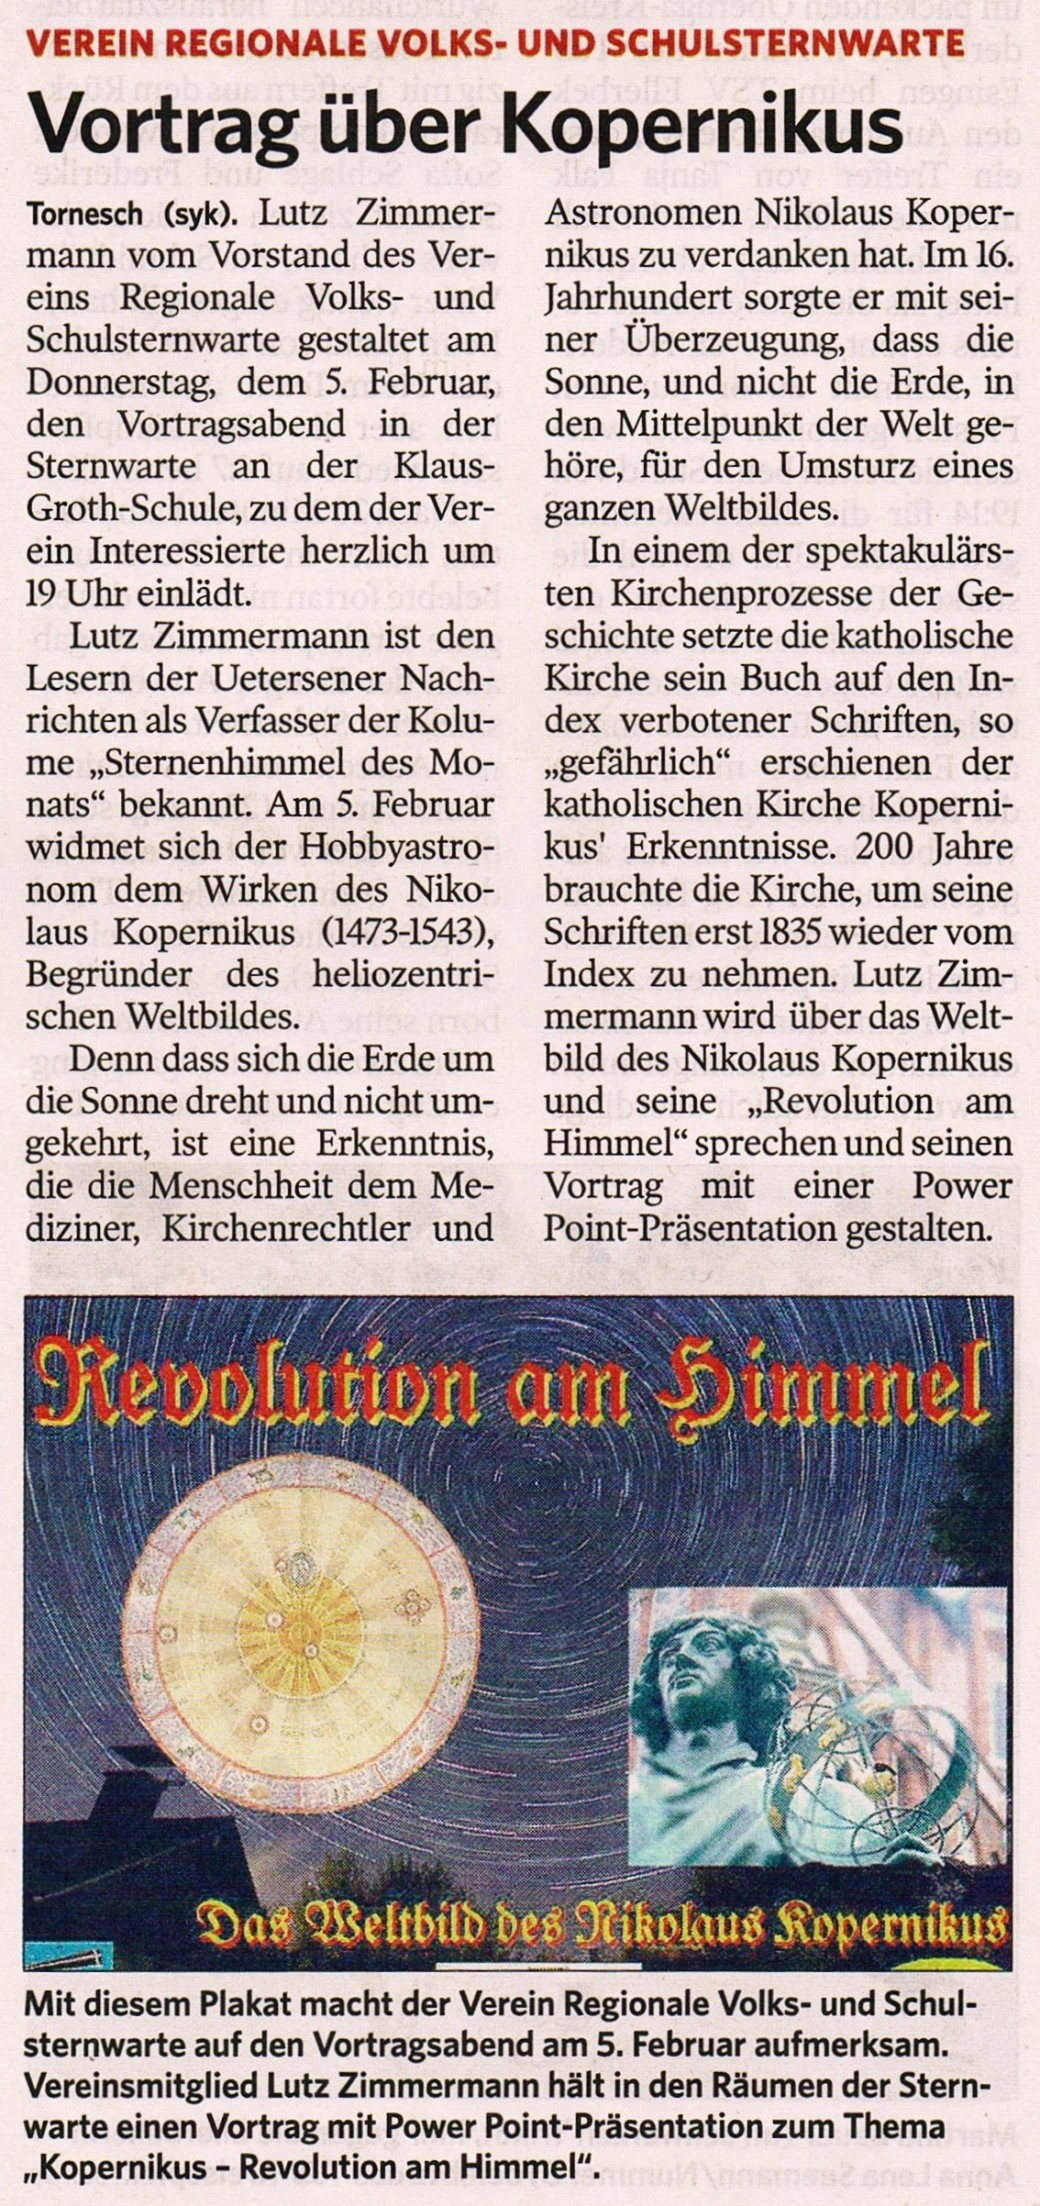 Ankündigumg on der UENA am 28.01.2015